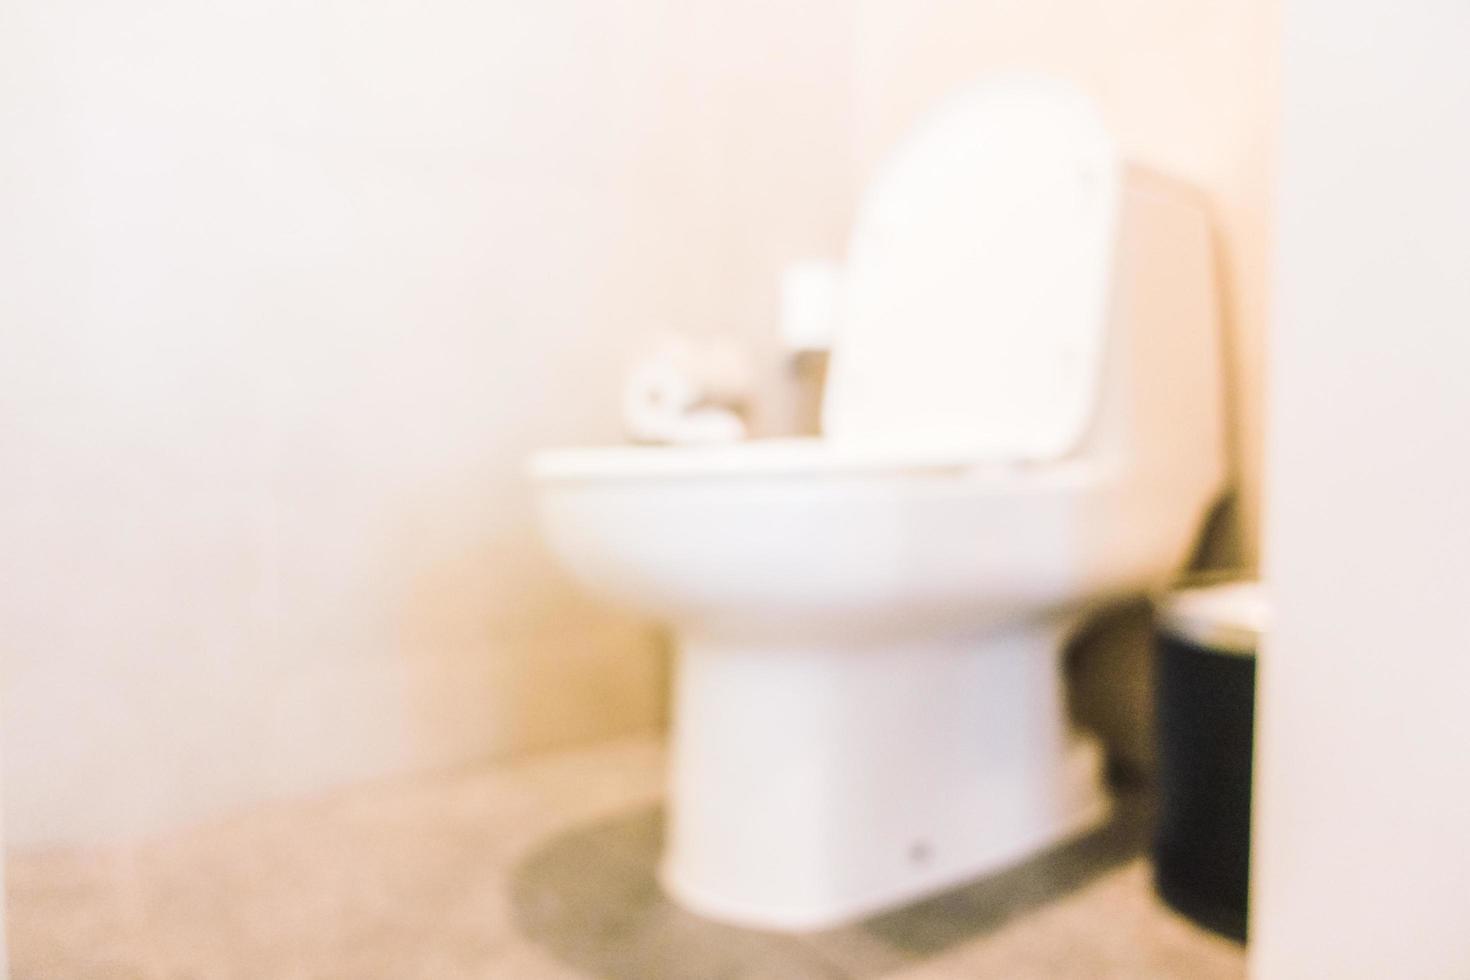 abstracte wazig badkamer foto